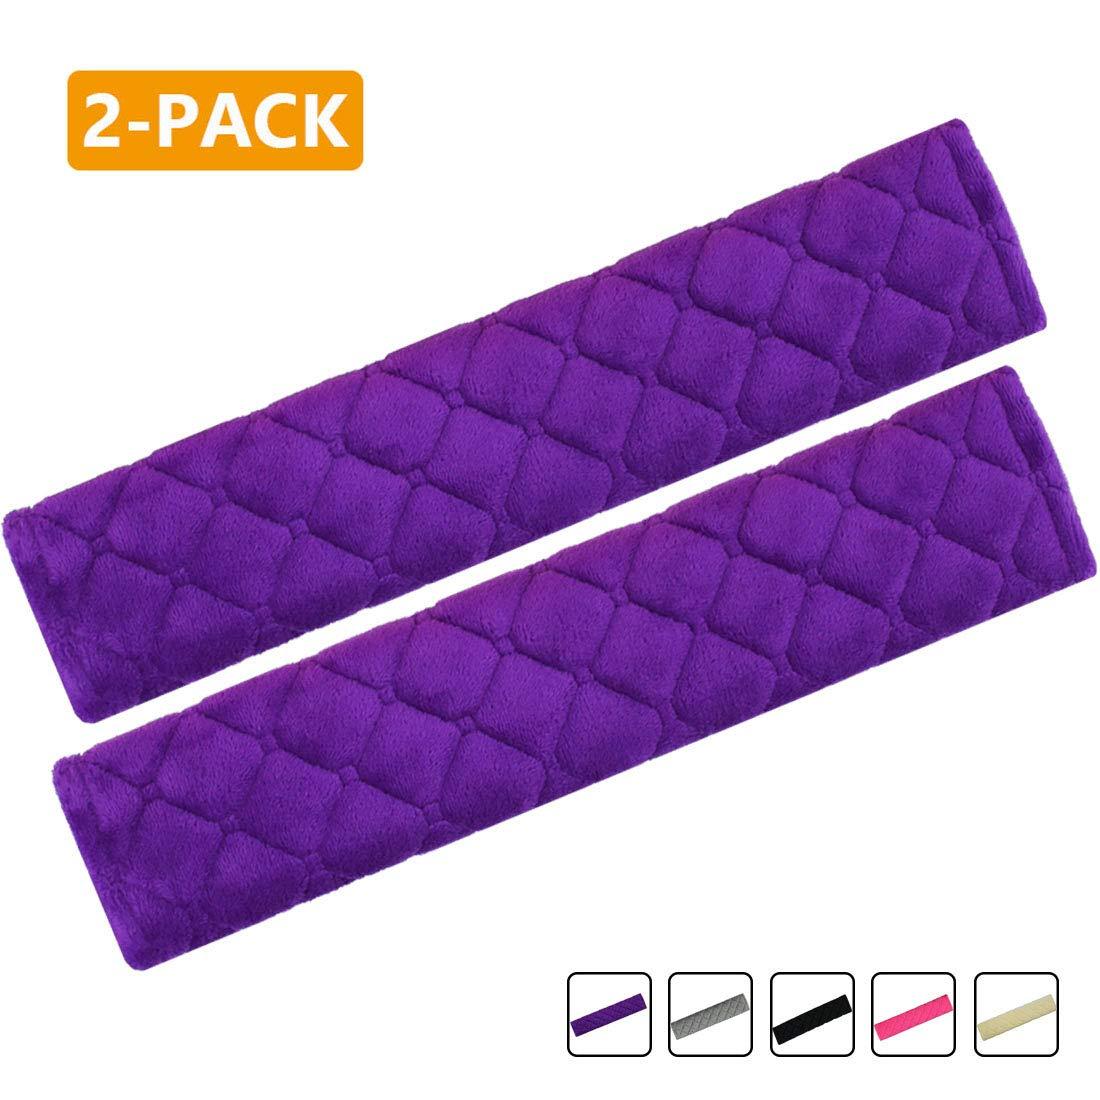 Gray 2-Pack Soft Car Safety Seat Belt Strap Shoulder Pad for Adults and Children Laptop Computer Bag MIRKOO Car Seat Belt Cover Pad Shoulder Bag Suitable for Car Seat Belt Backpack